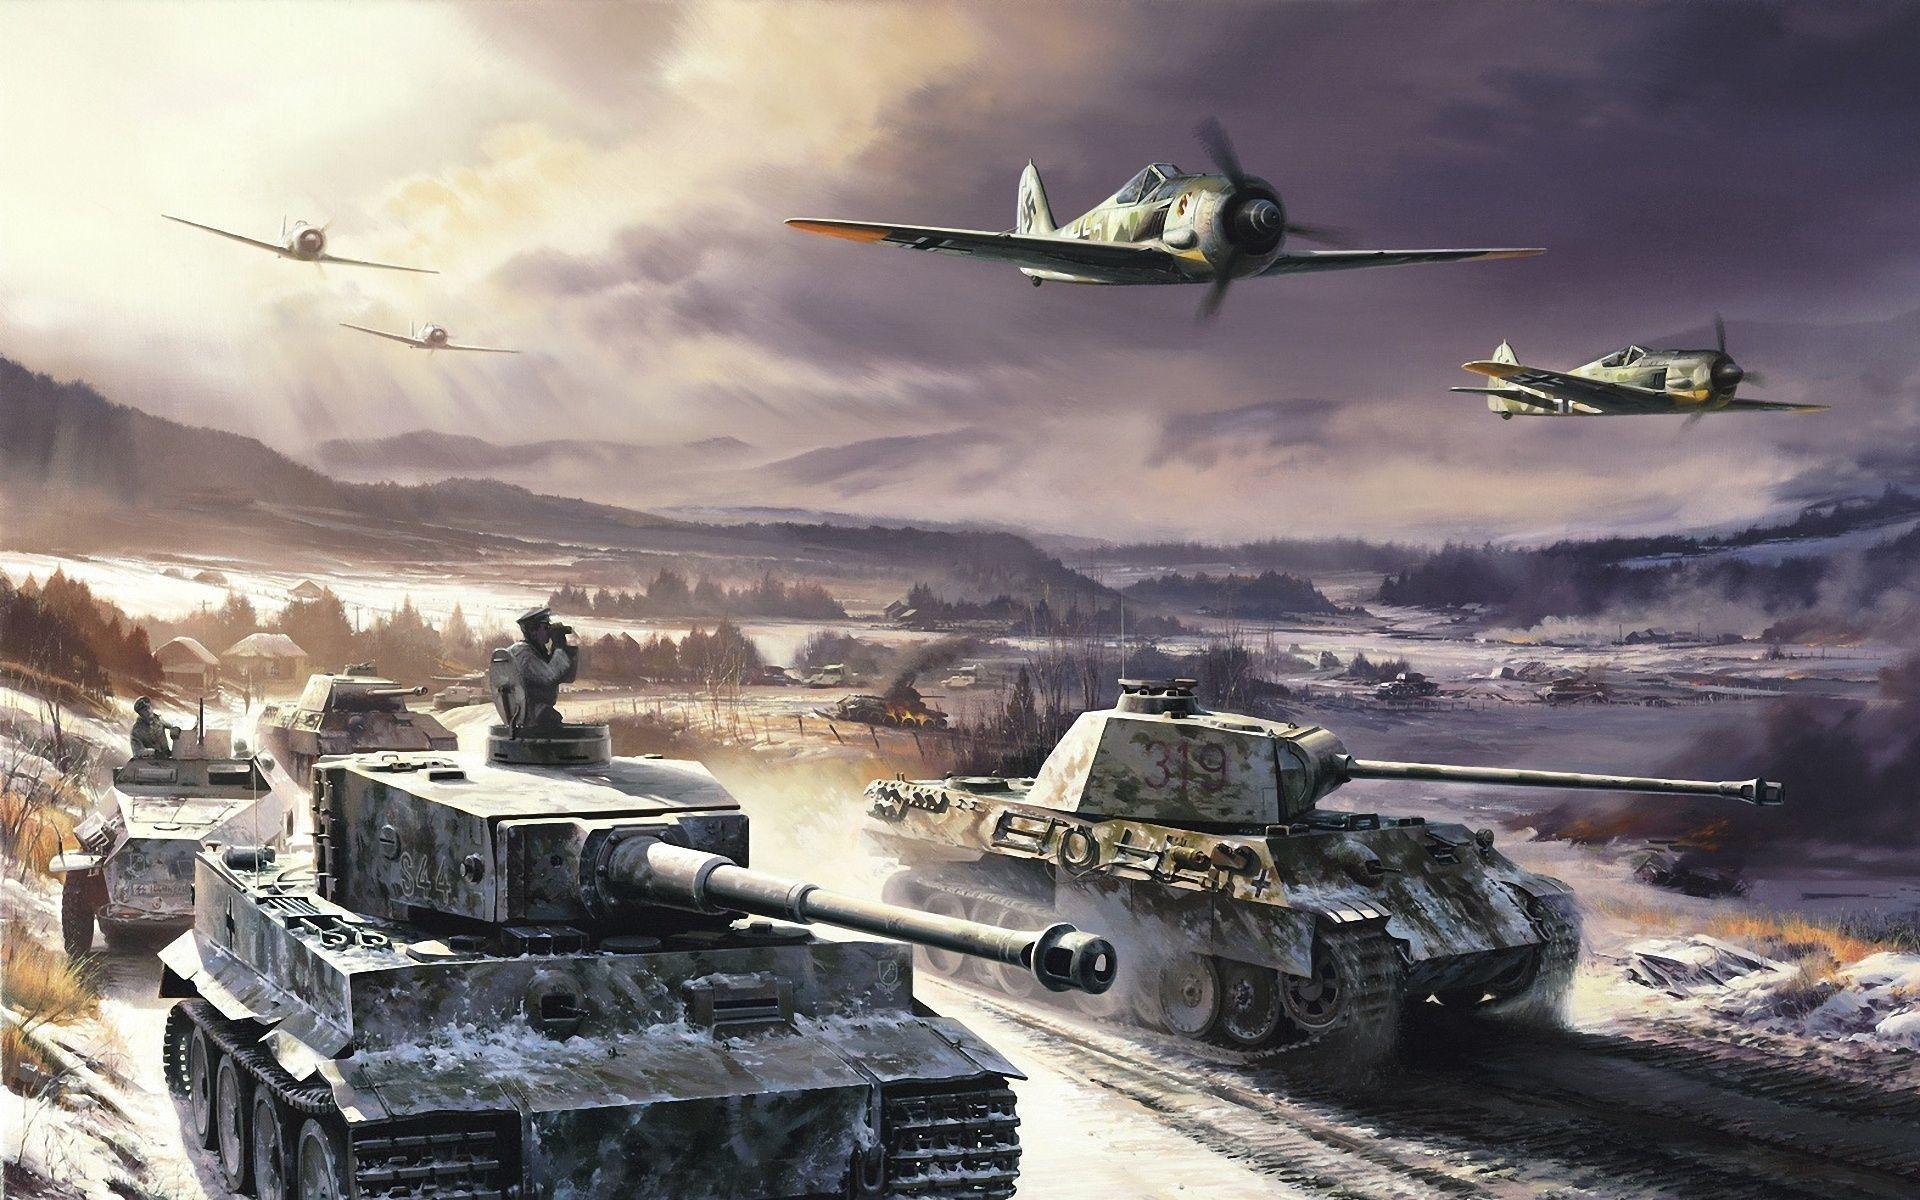 Tank Wallpapers   Top Tank Backgrounds   WallpaperAccess 1920x1200